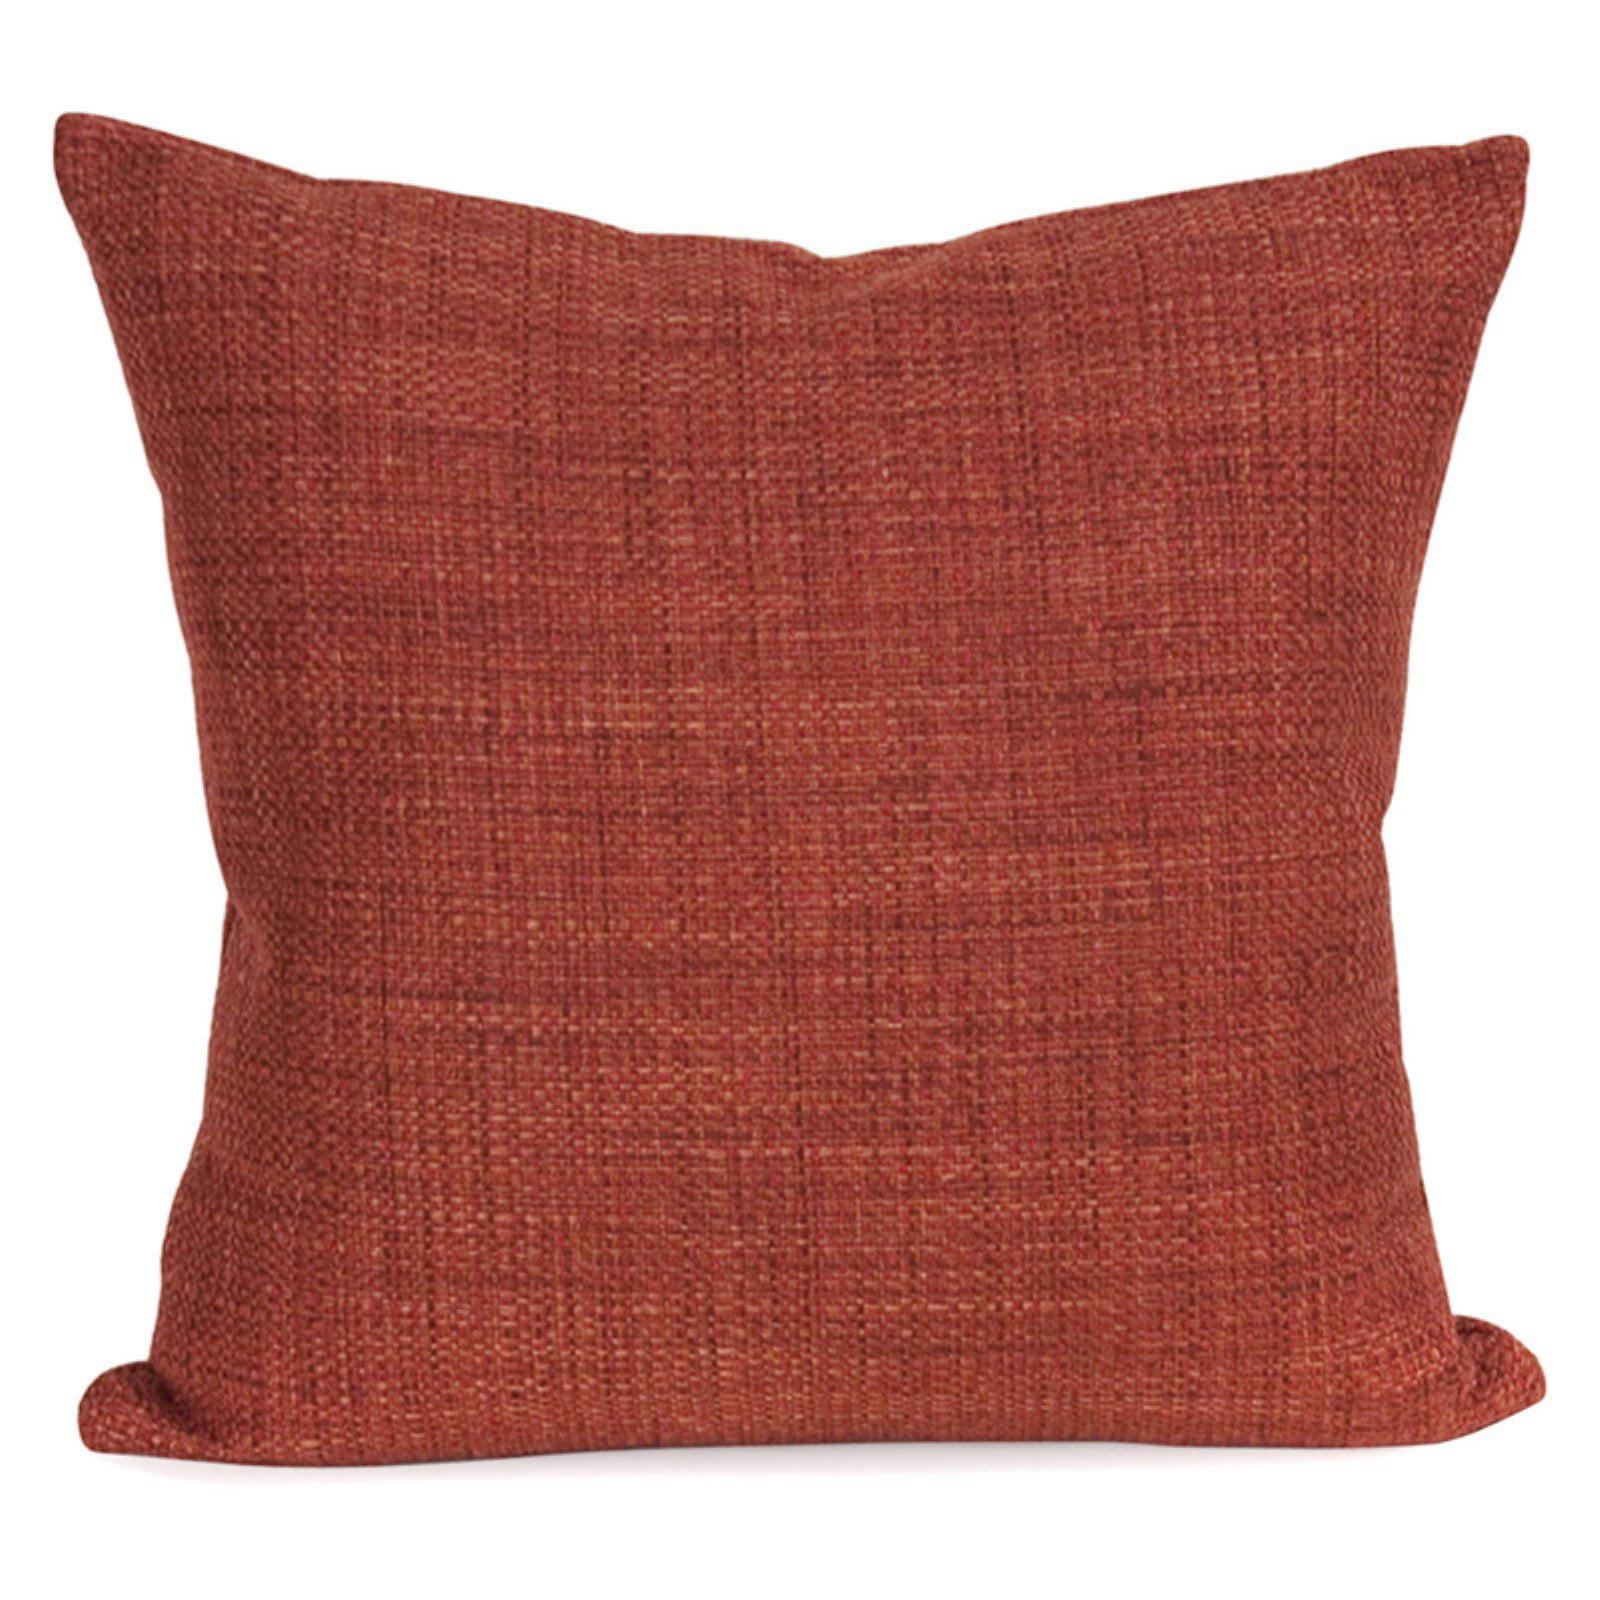 Elizabeth Austin Coco Decorative Throw Pillow by Howard Elliott